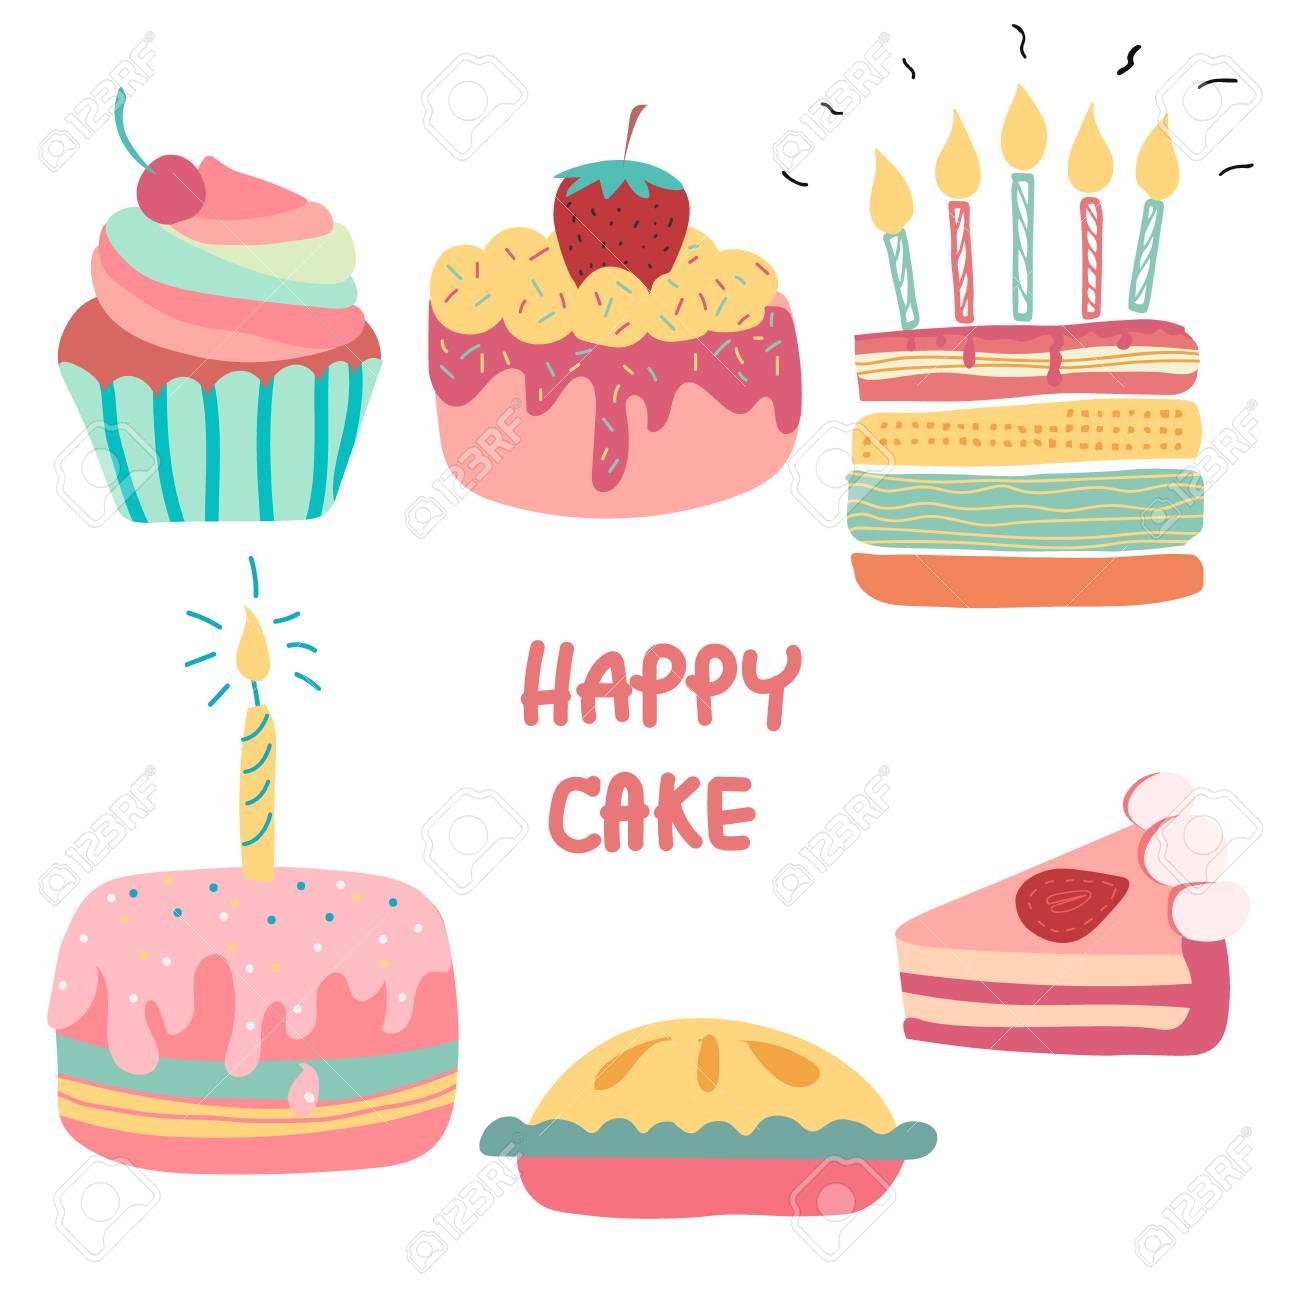 Strange Doodle Hand Drawn Rainbow Cute Birthday Cake Royalty Free Cliparts Funny Birthday Cards Online Elaedamsfinfo